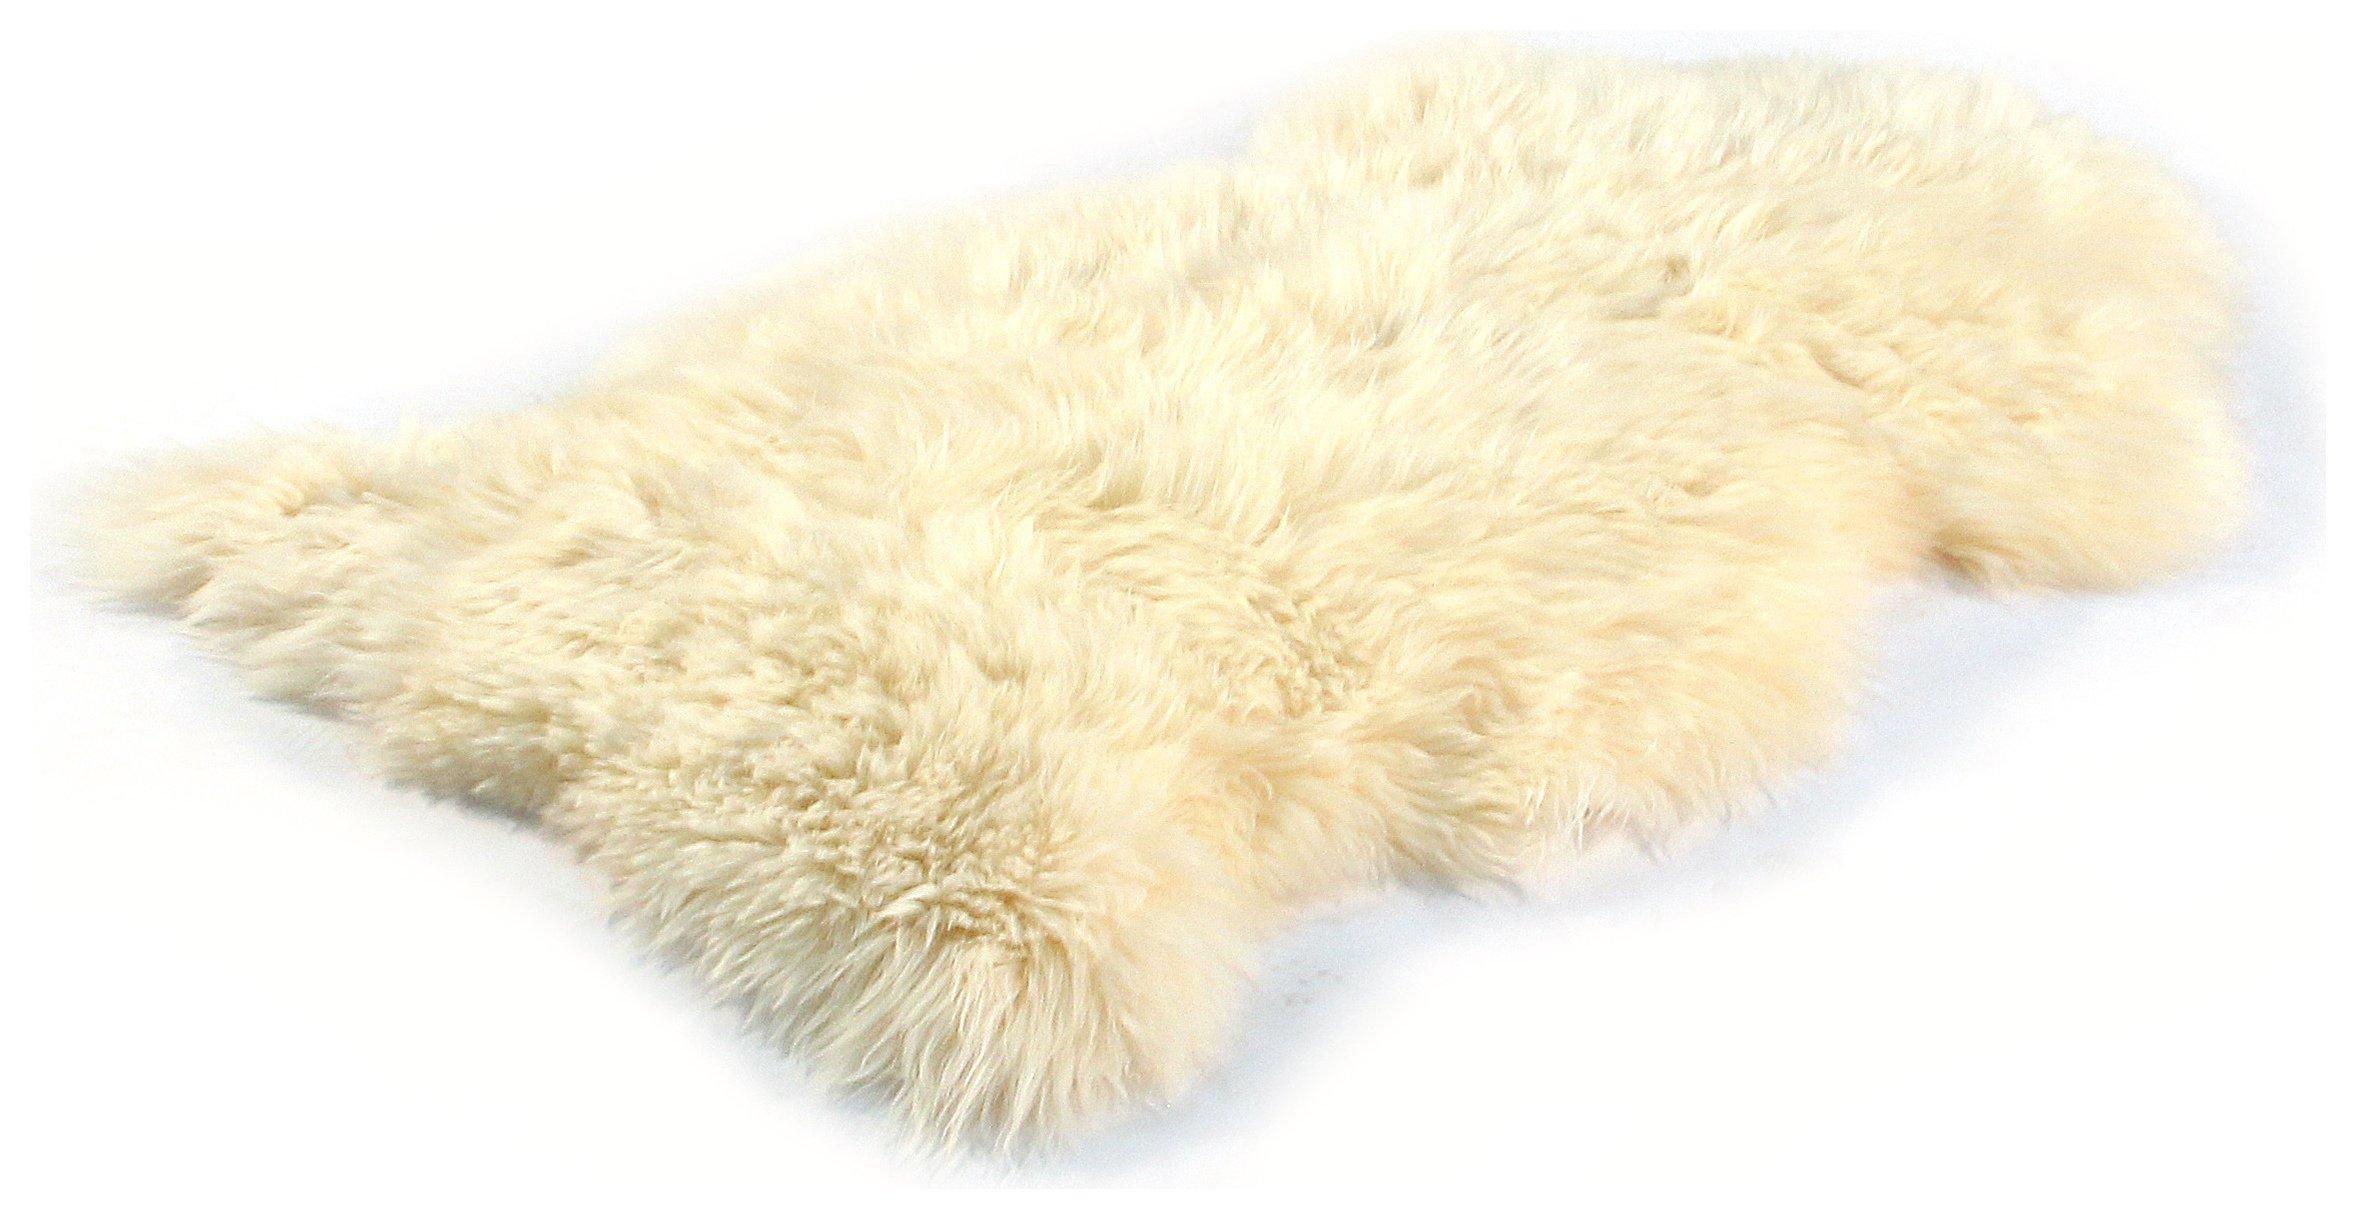 Image of Bowron Sheepskin Longwool Rug - 60x95cm - Champagne